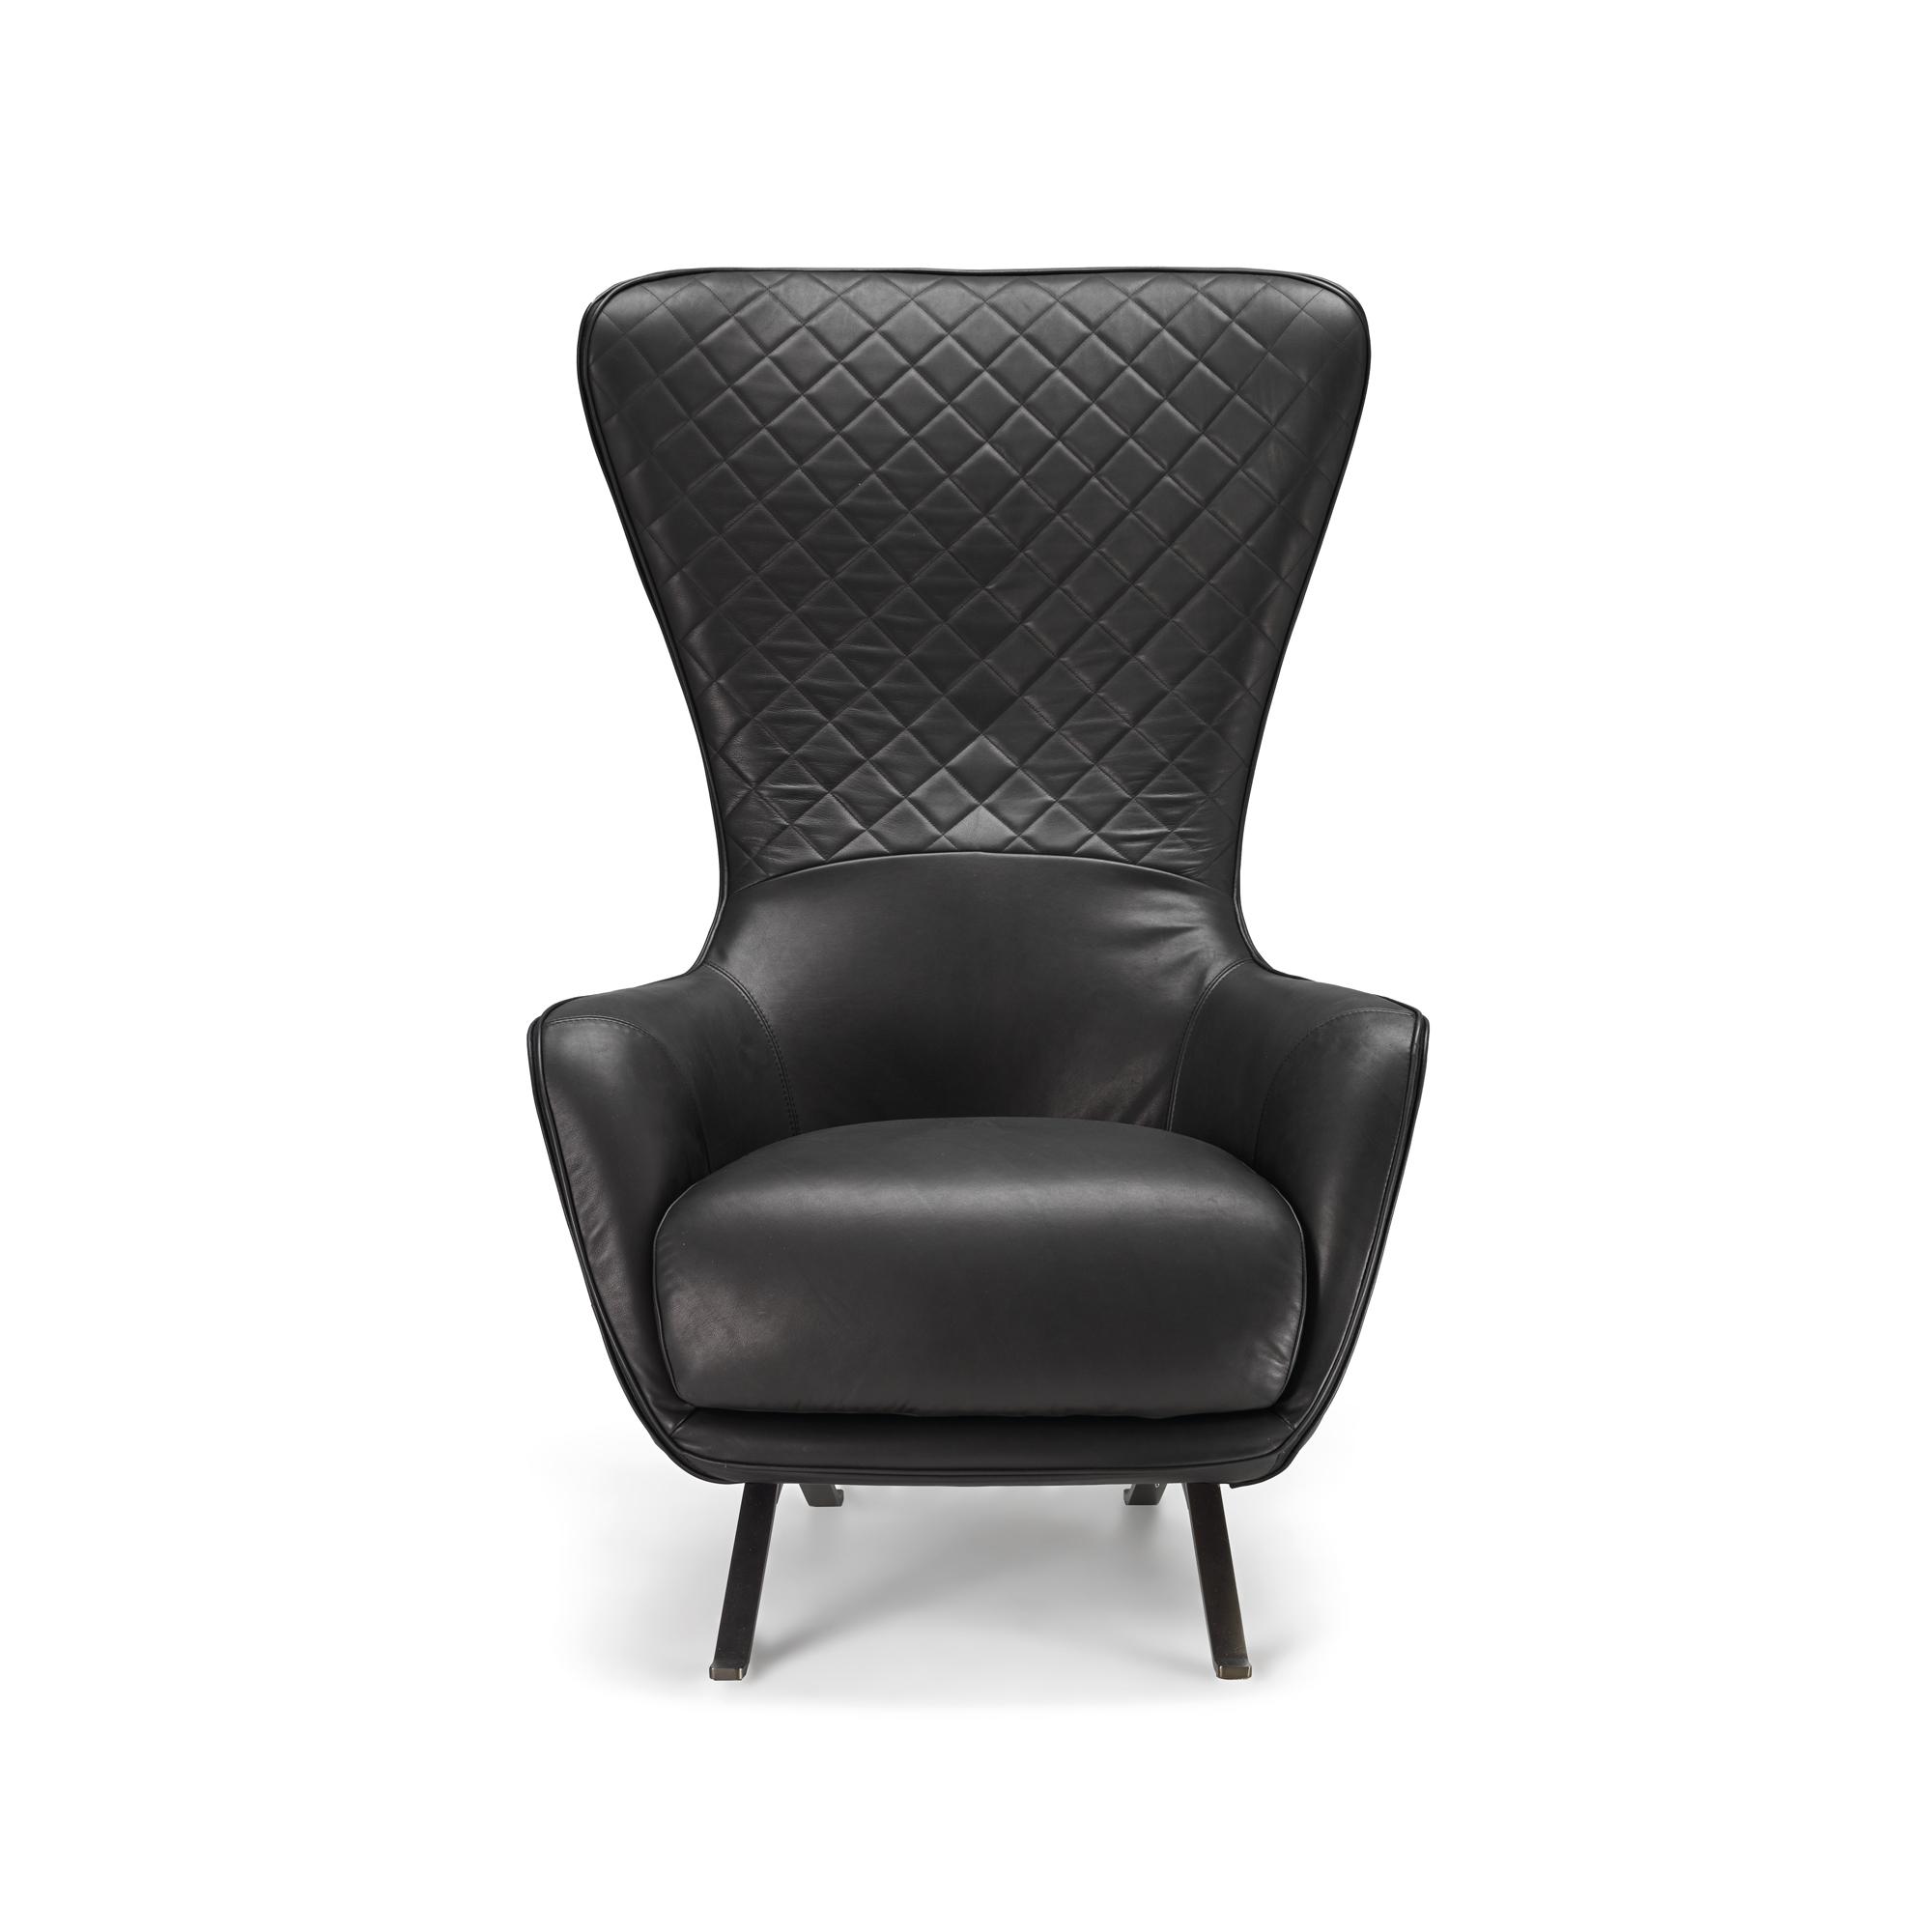 Contemporary luxury Italian Sin Seaty Lounge Chair